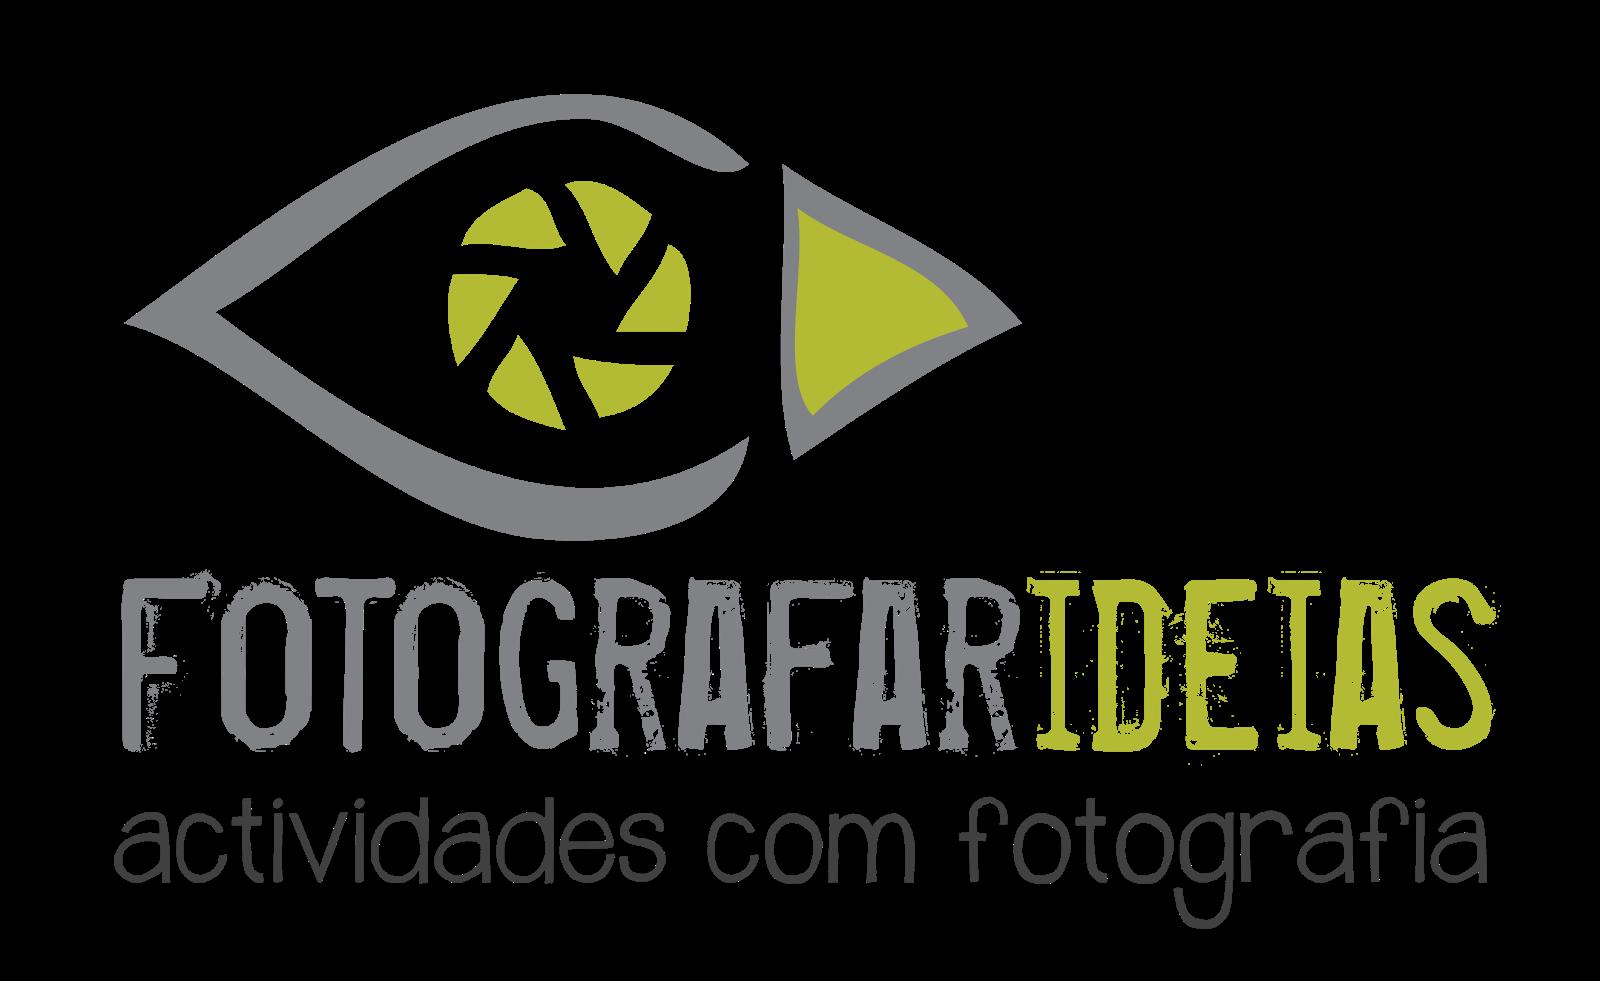 Workshops/ Passeios Fotográficos